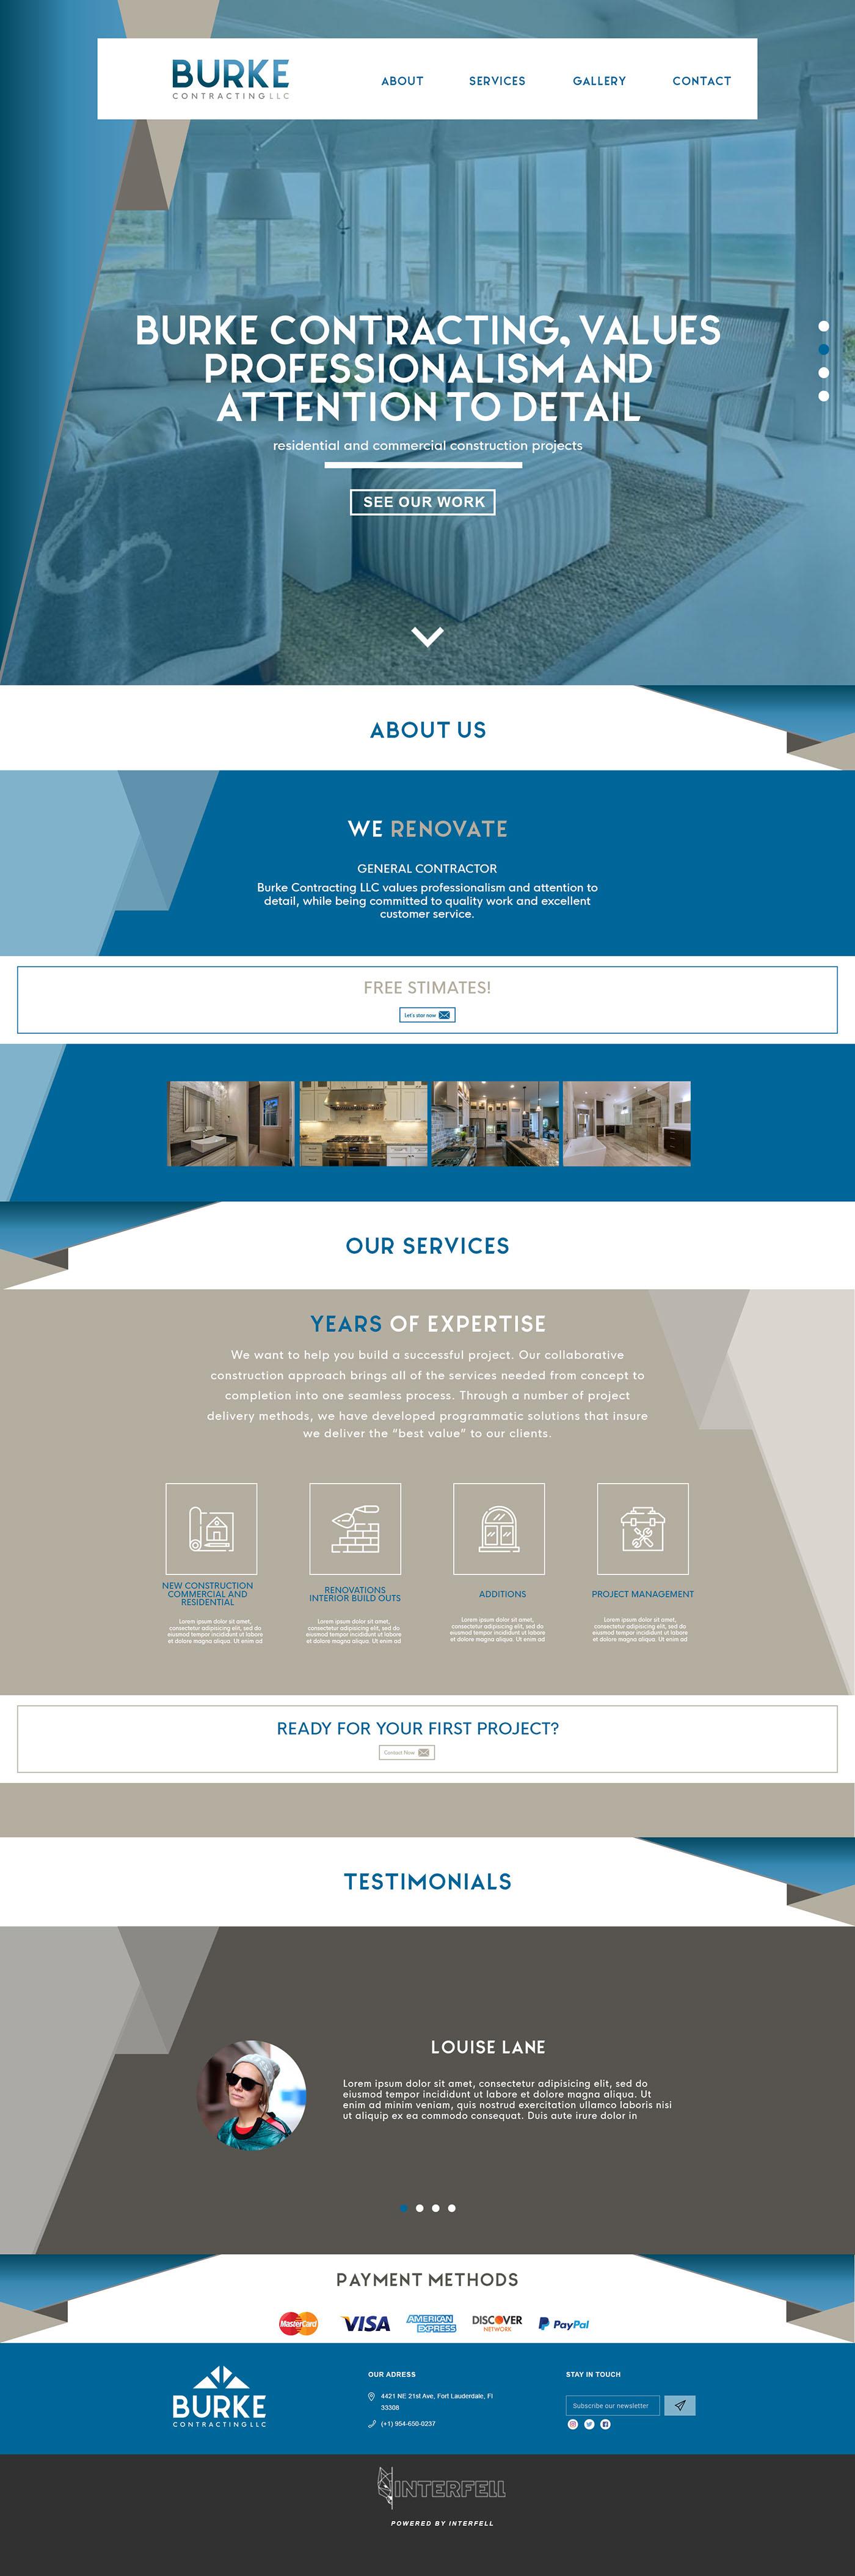 design Interface UI ux Web graphic